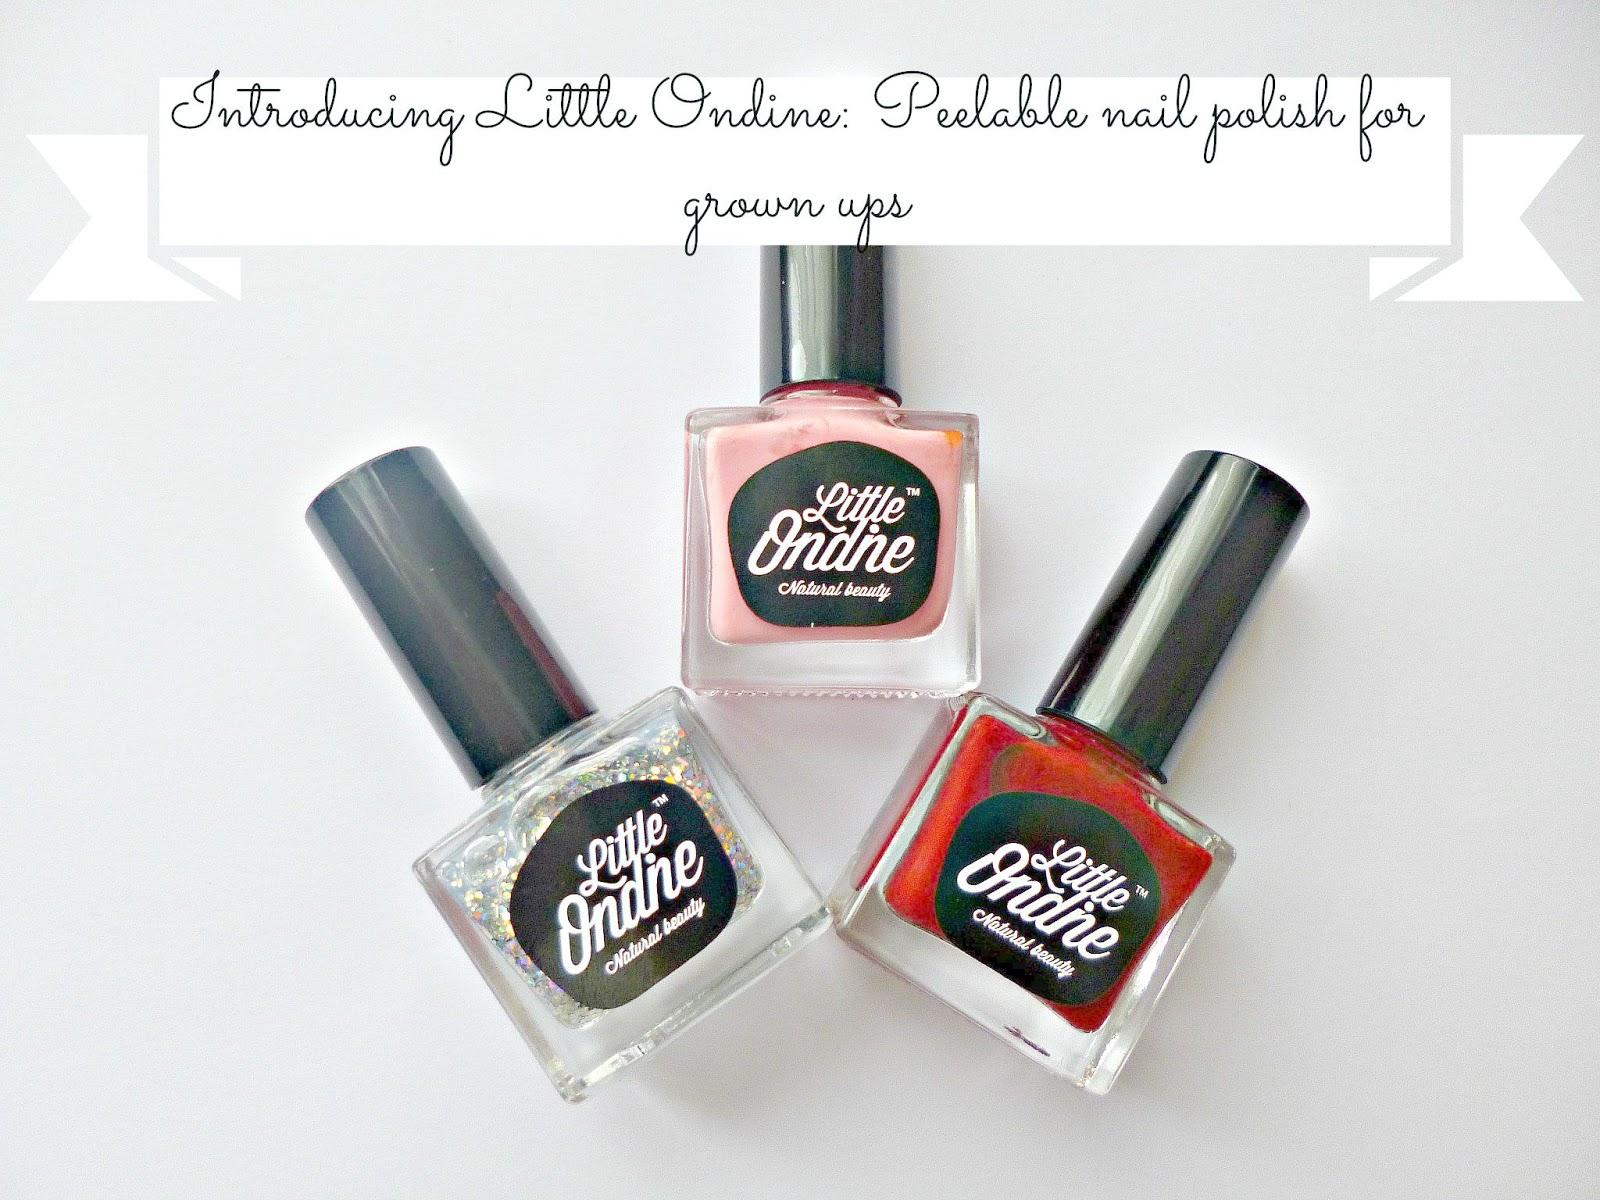 Little Ondine: Peelable nail polish for grown ups - Ana goes green...